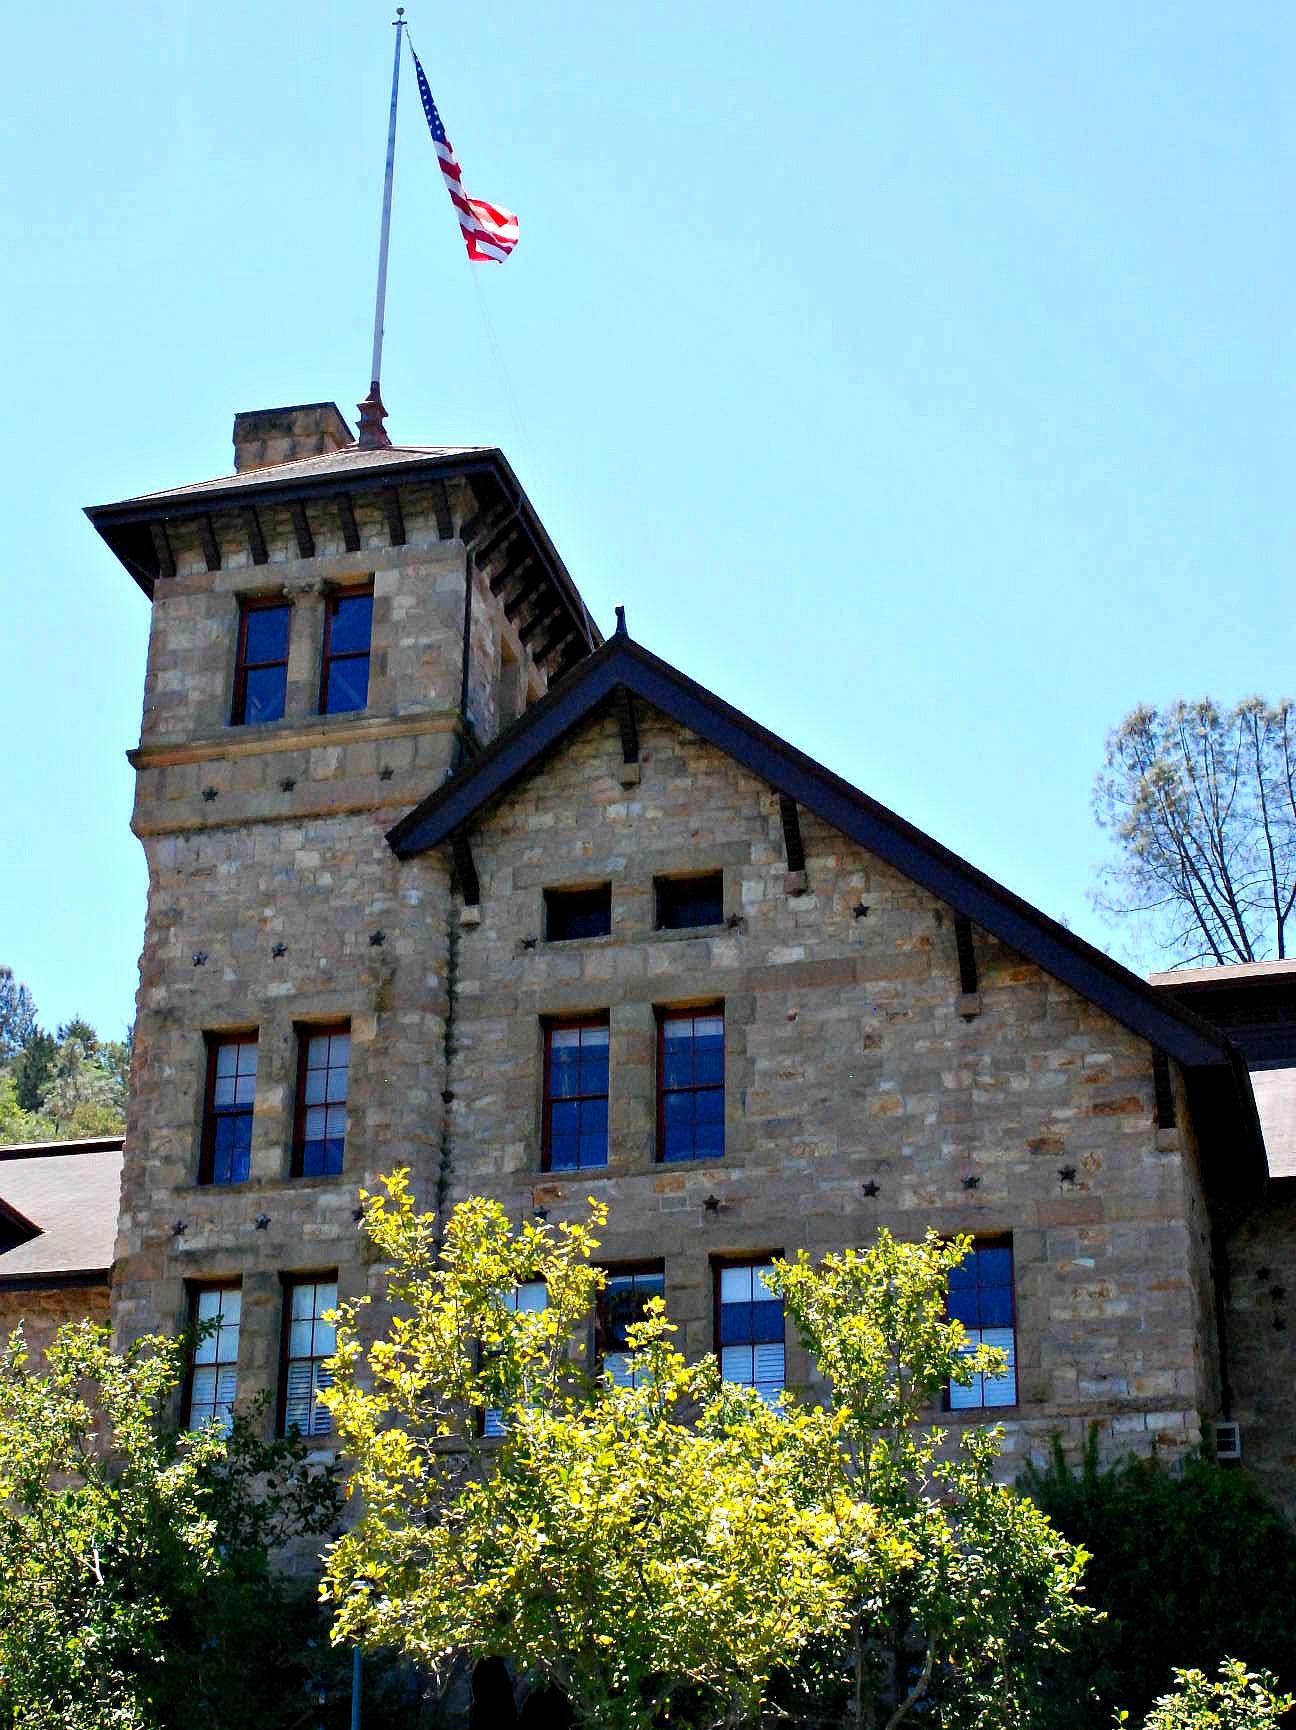 Culinary Institute of America greystone